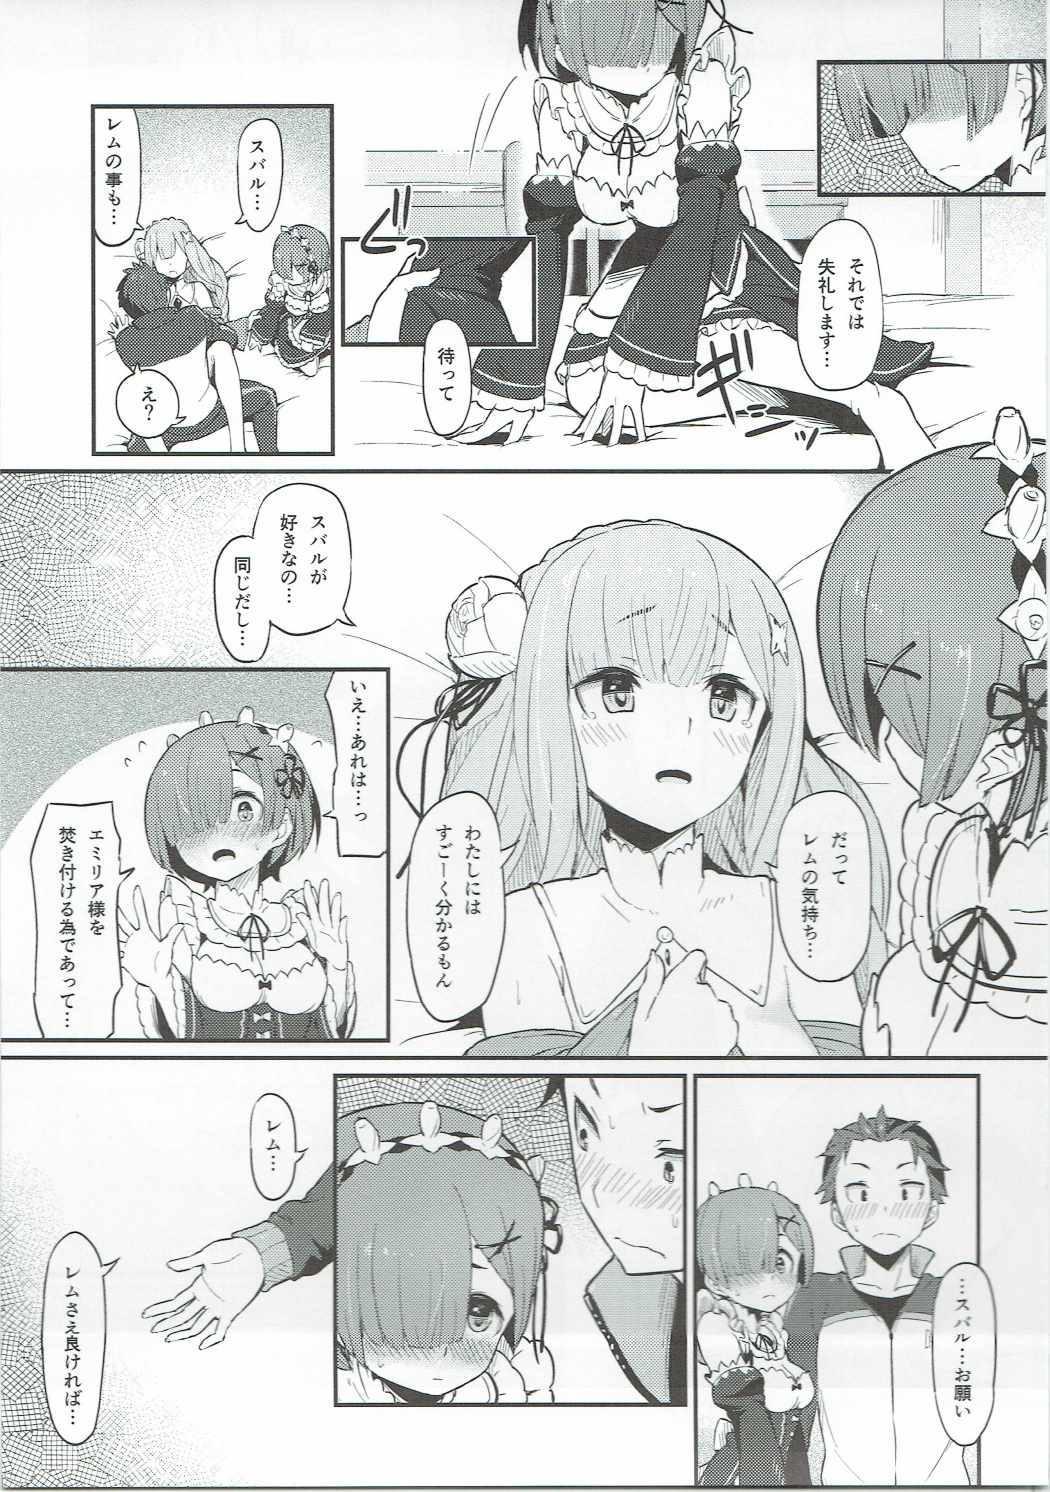 Rem no Emilia Kuttsuke Daisakusen 19